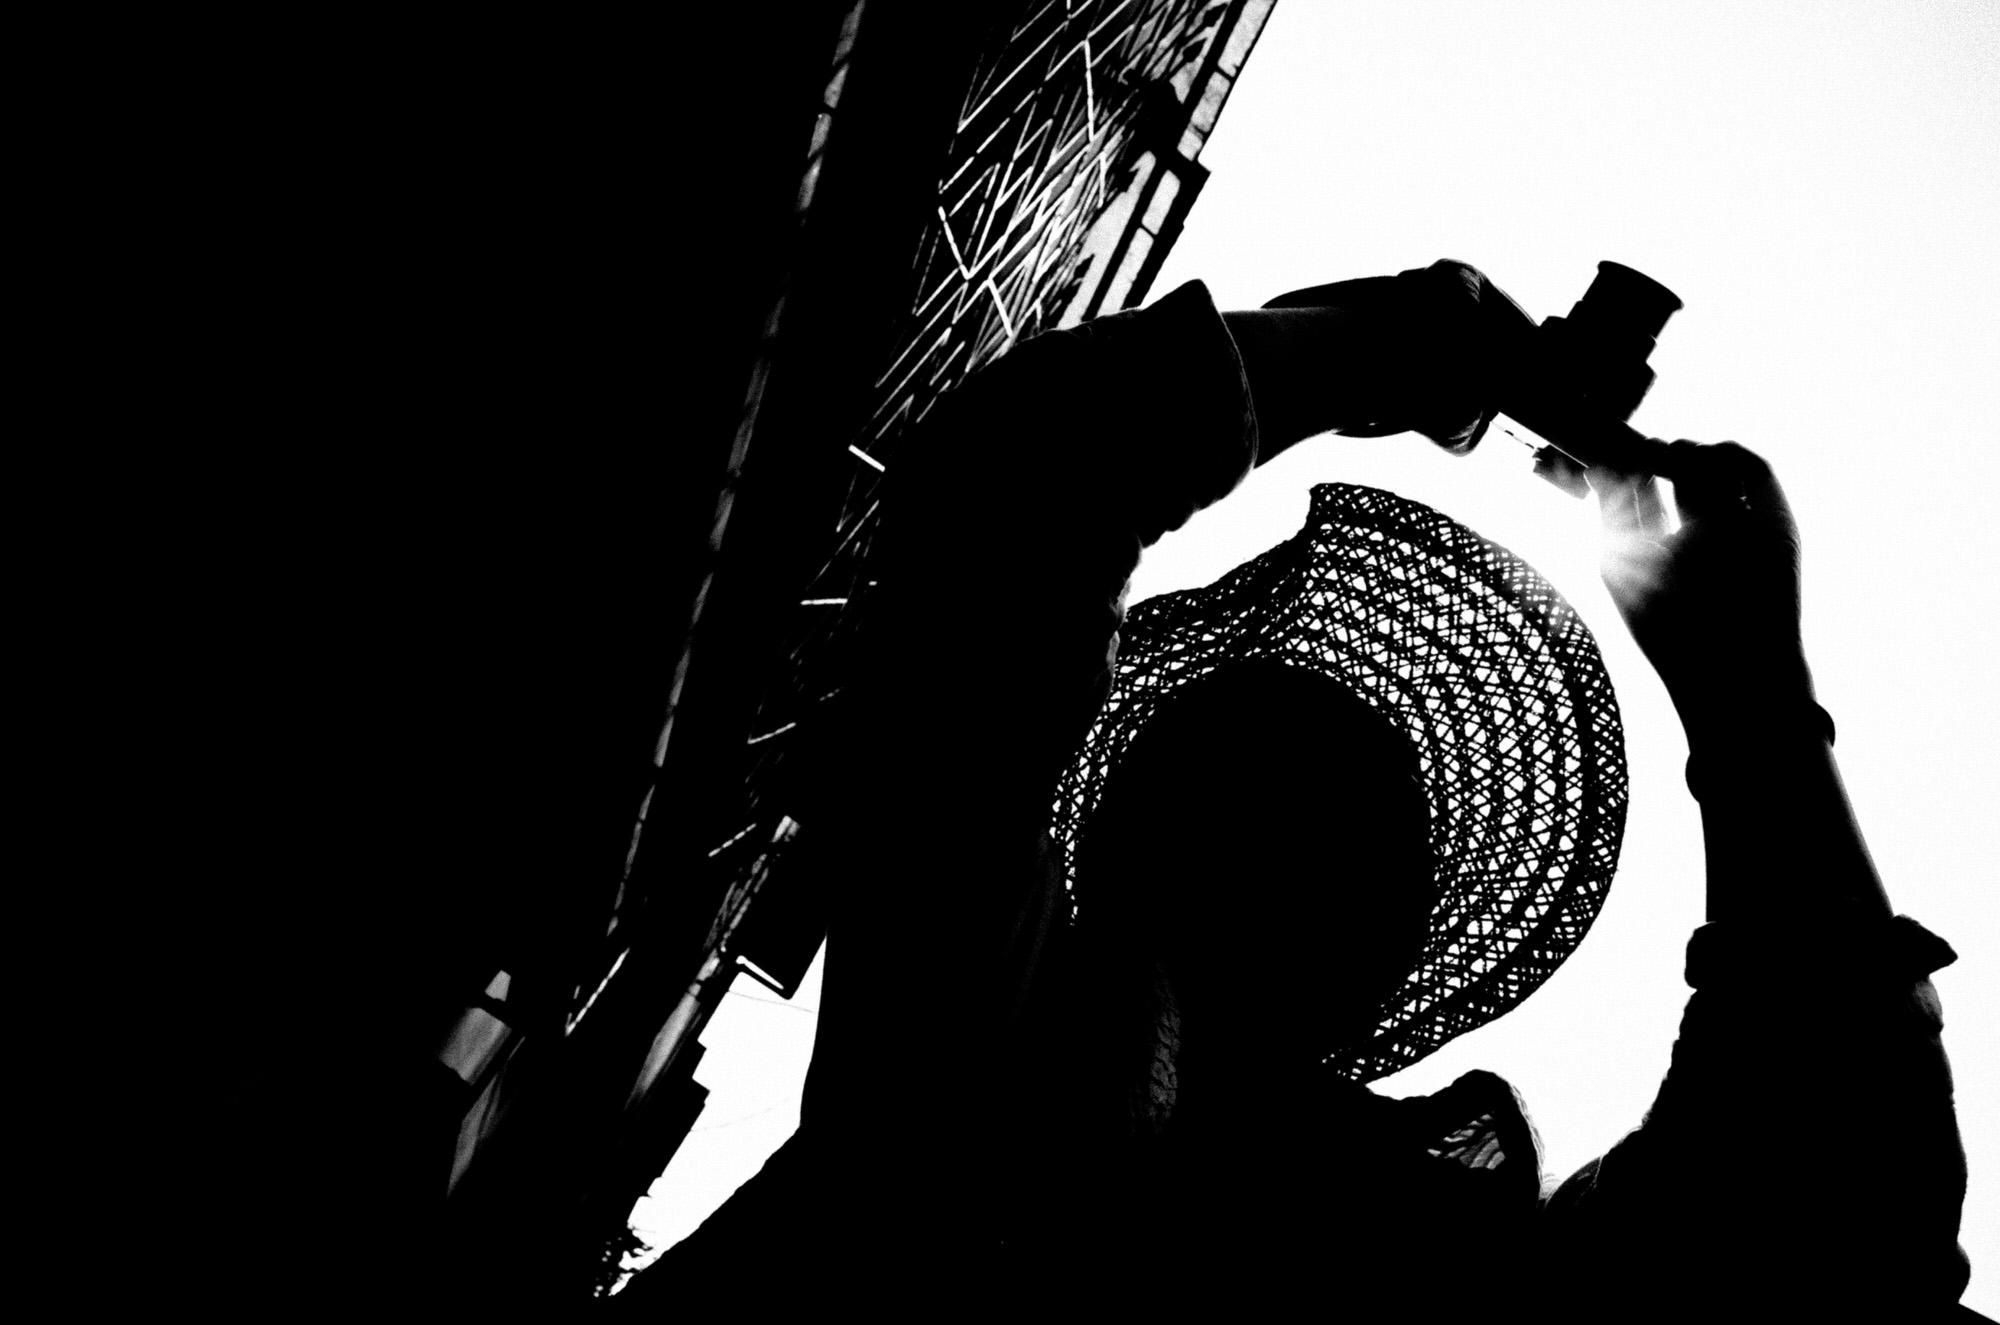 eric kim photography black and white - 33151528303_6d7c6a2e57_o